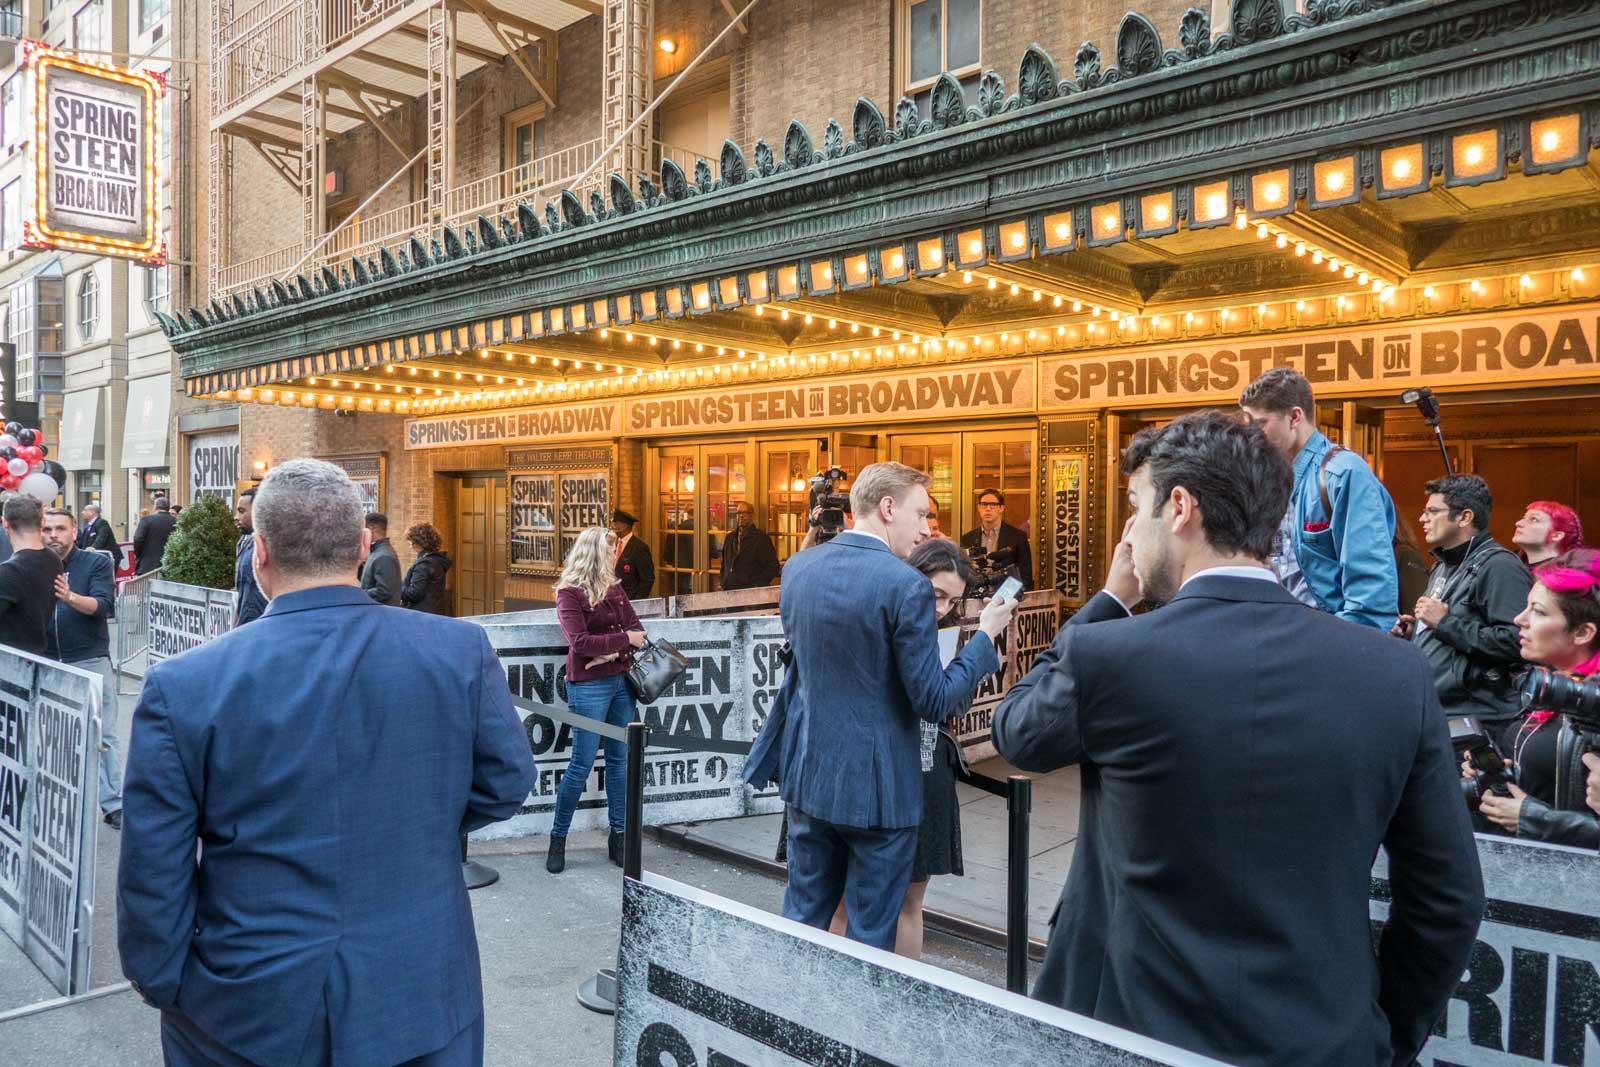 Springsteen on Broadway Walter Kerr Theatre